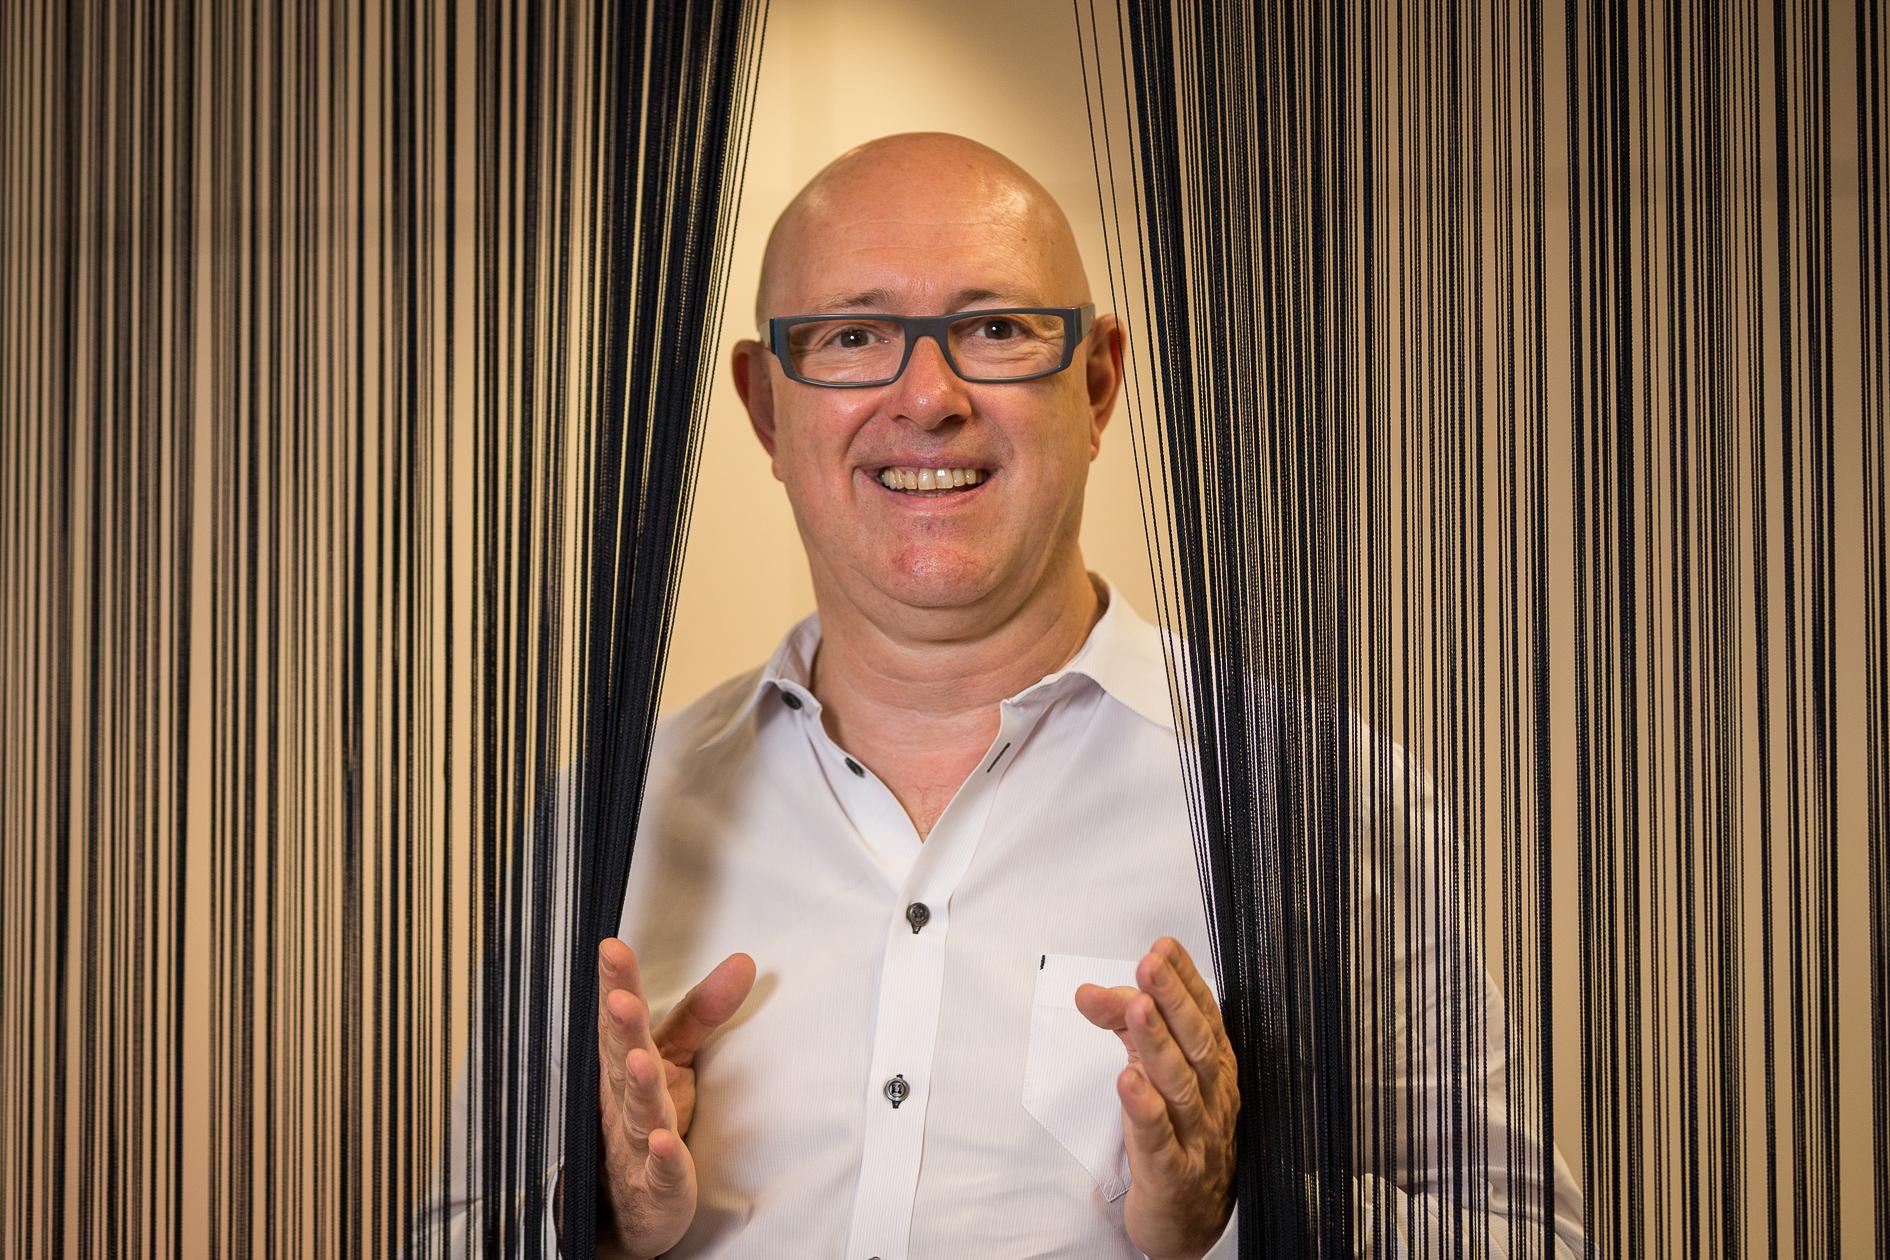 Frank Van Massenhove